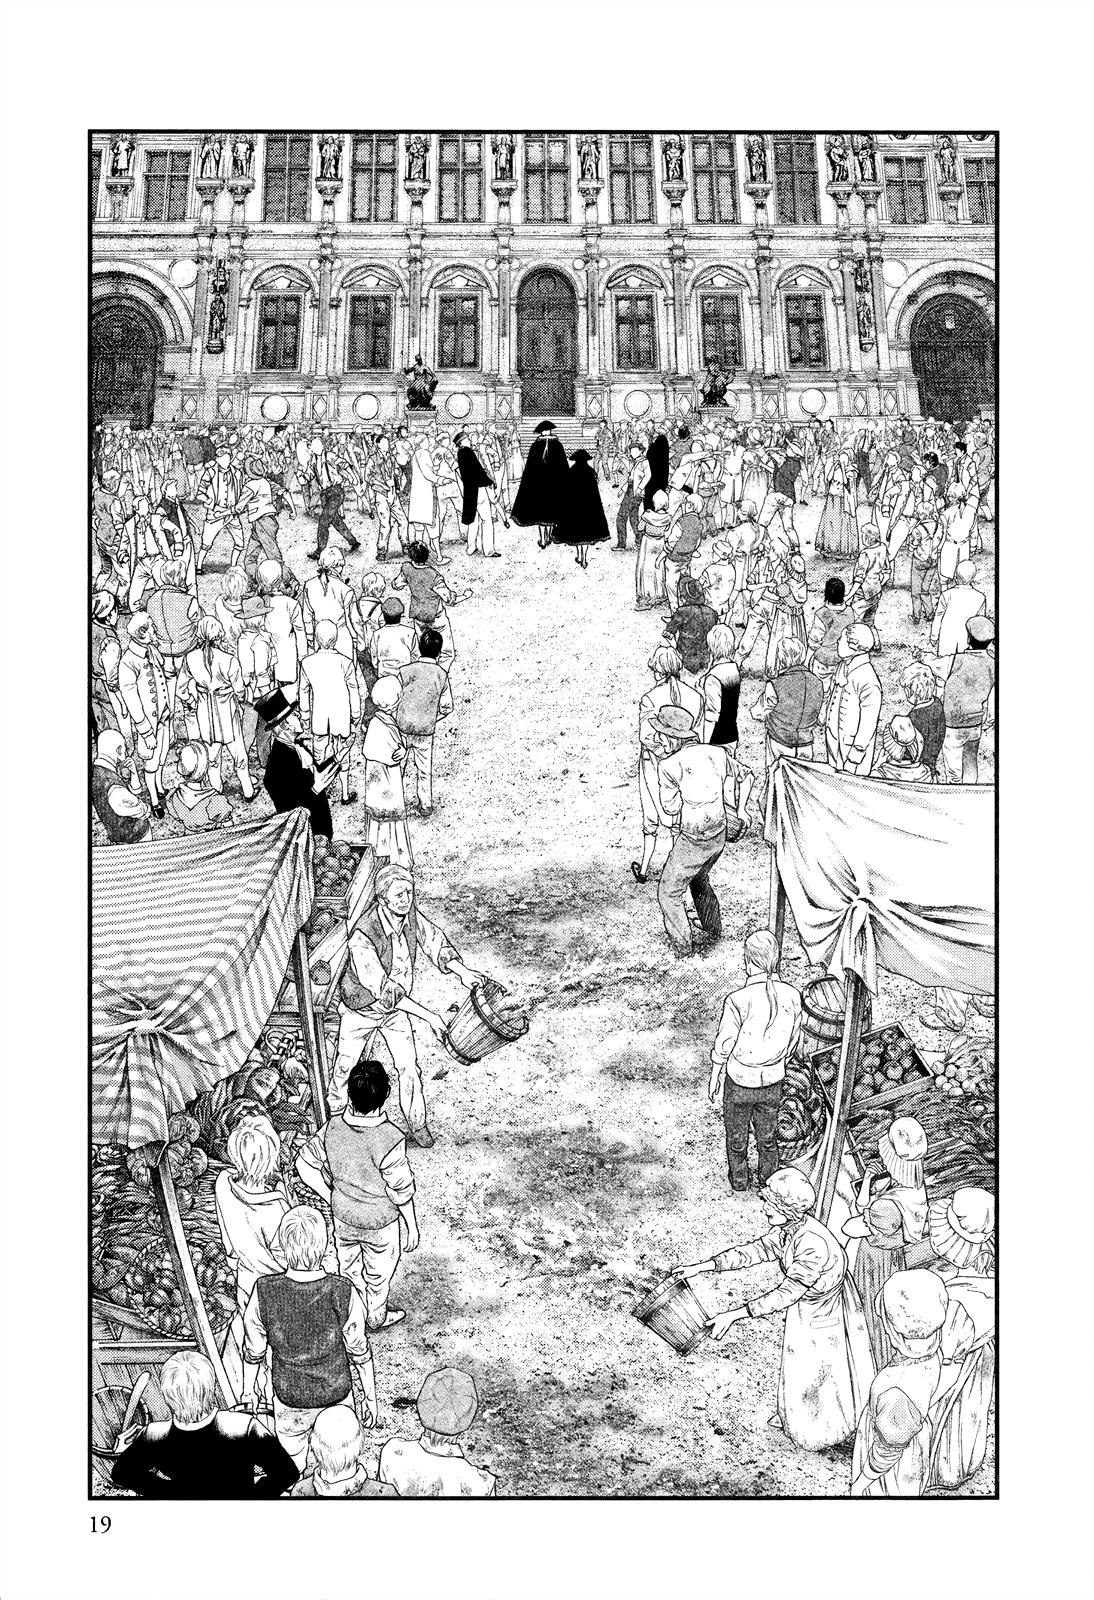 Read Innocent Manga